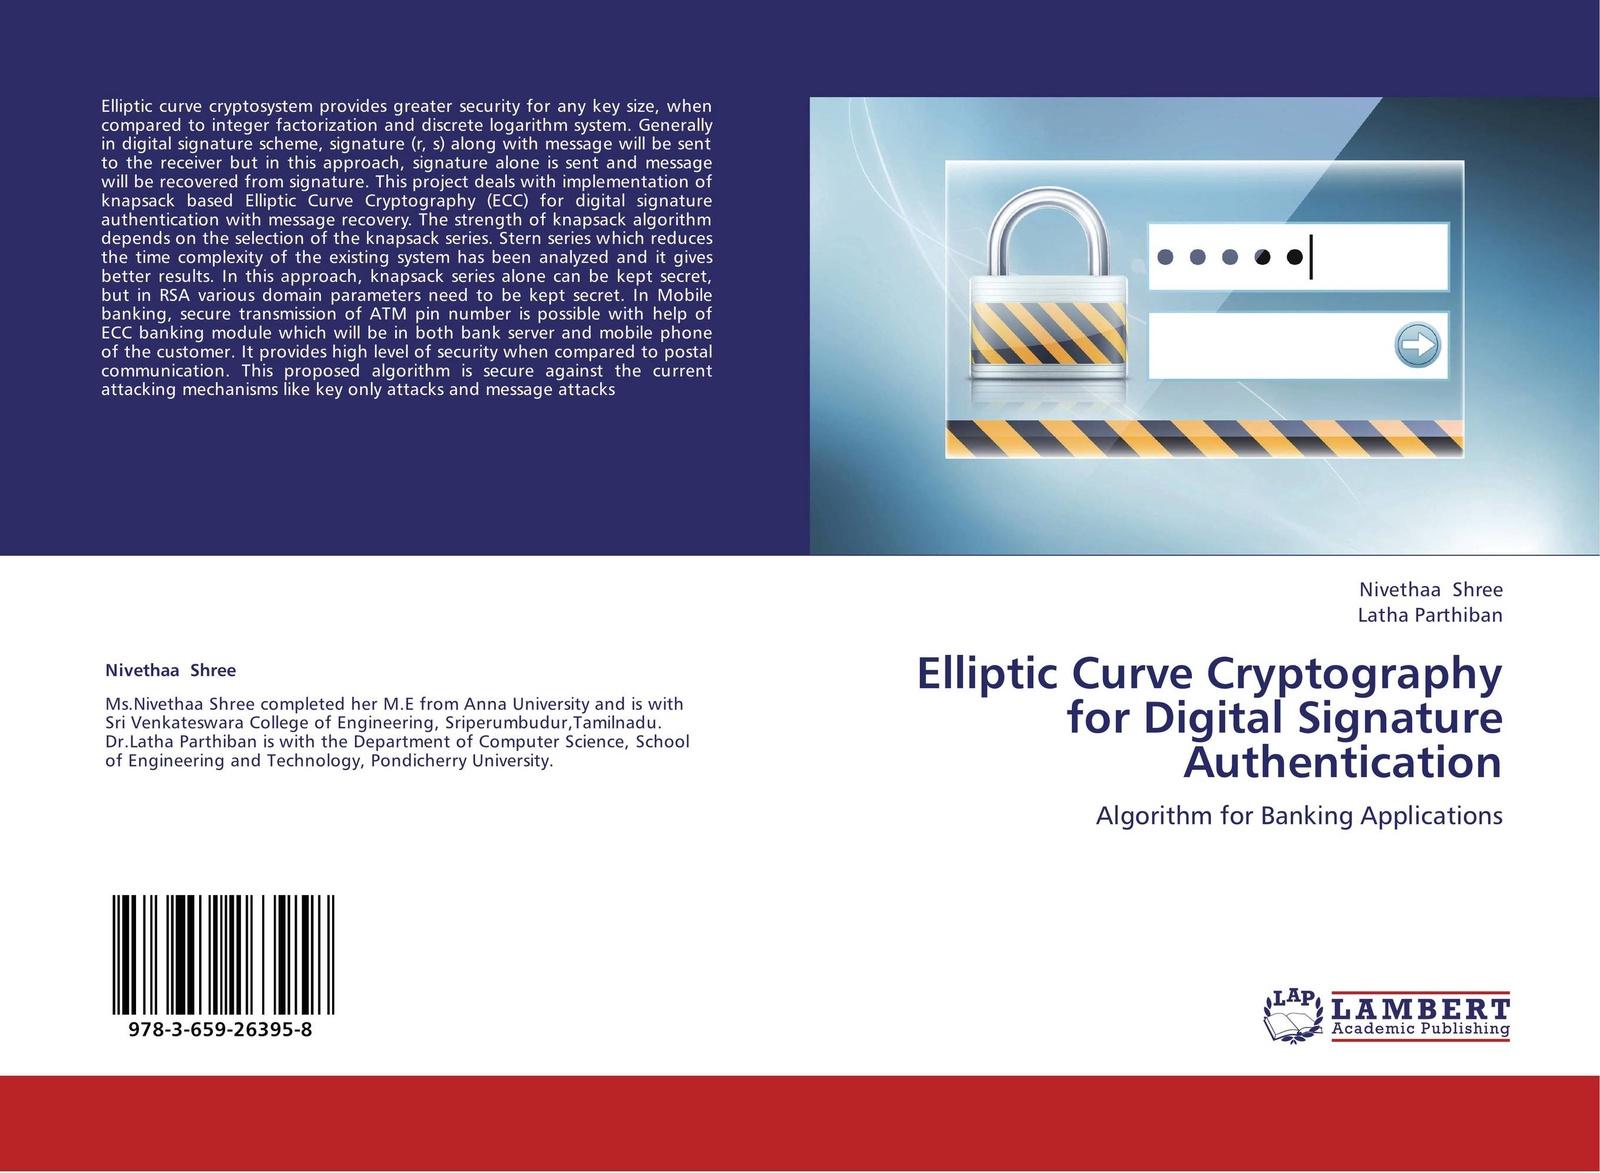 Nivethaa Shree and Latha Parthiban Elliptic Curve Cryptography for Digital Signature Authentication digital signature schemes based on multiple hard problems